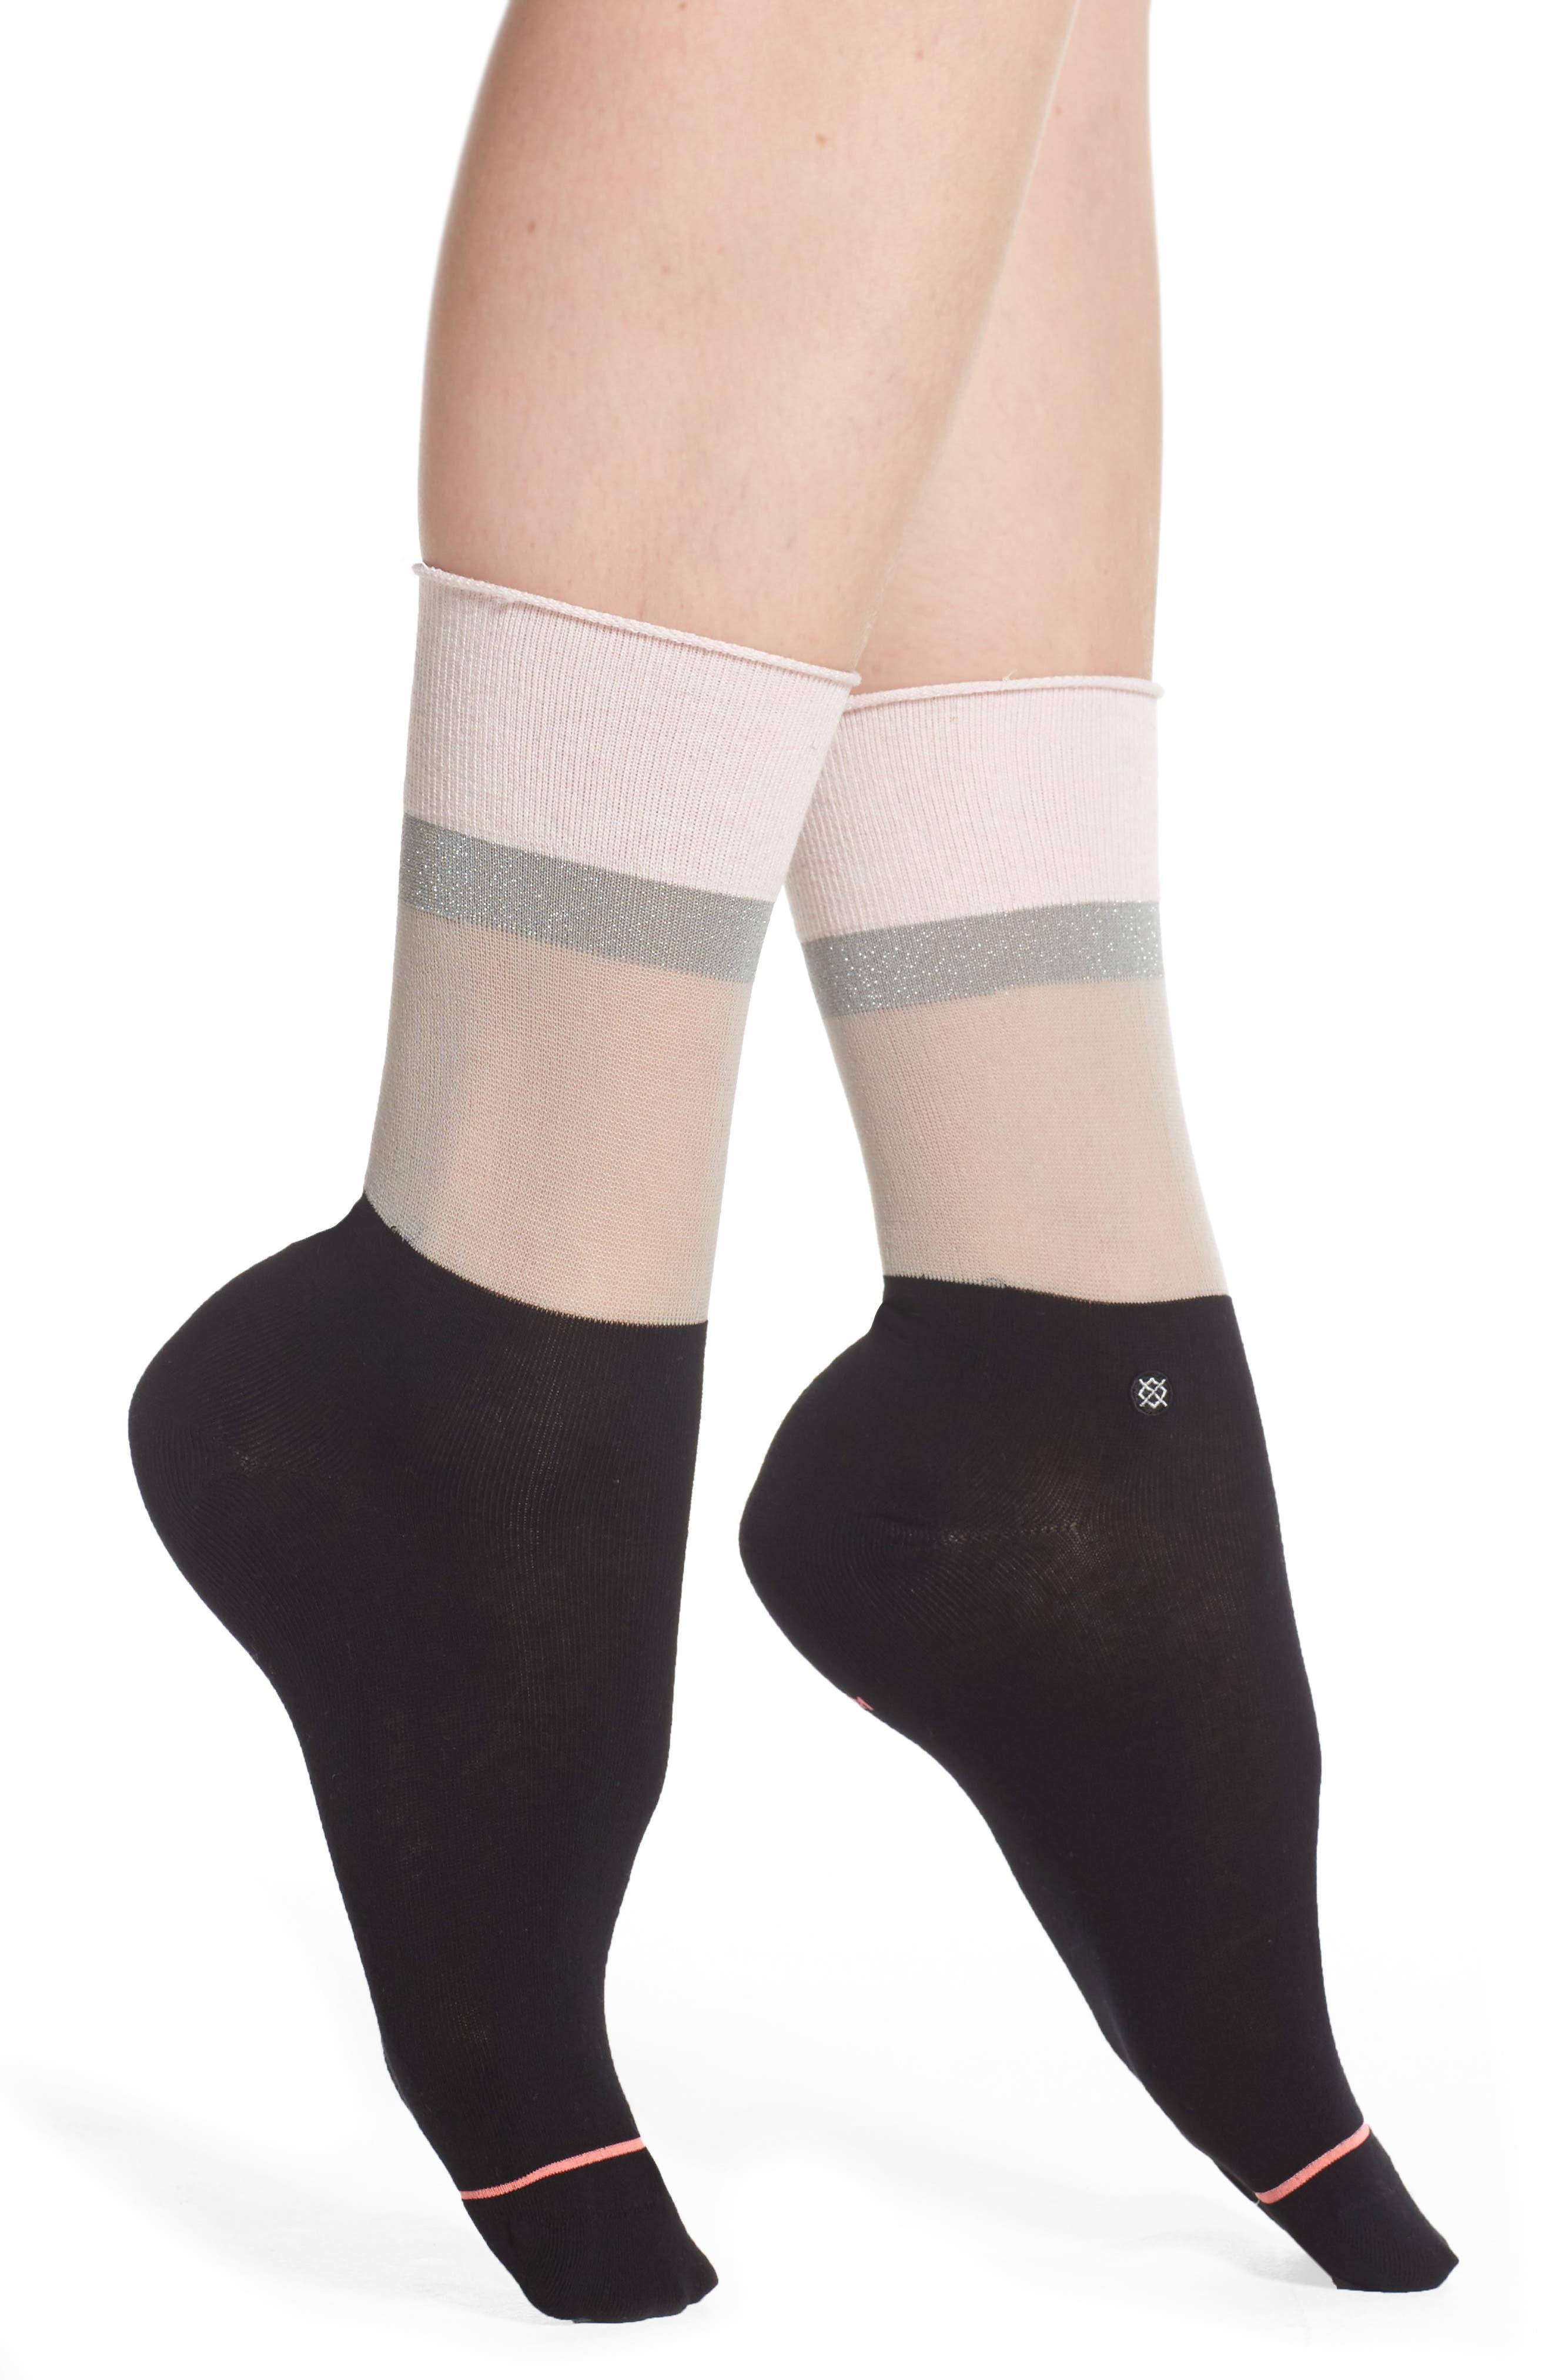 Main Image - Stance Cara Crew Socks